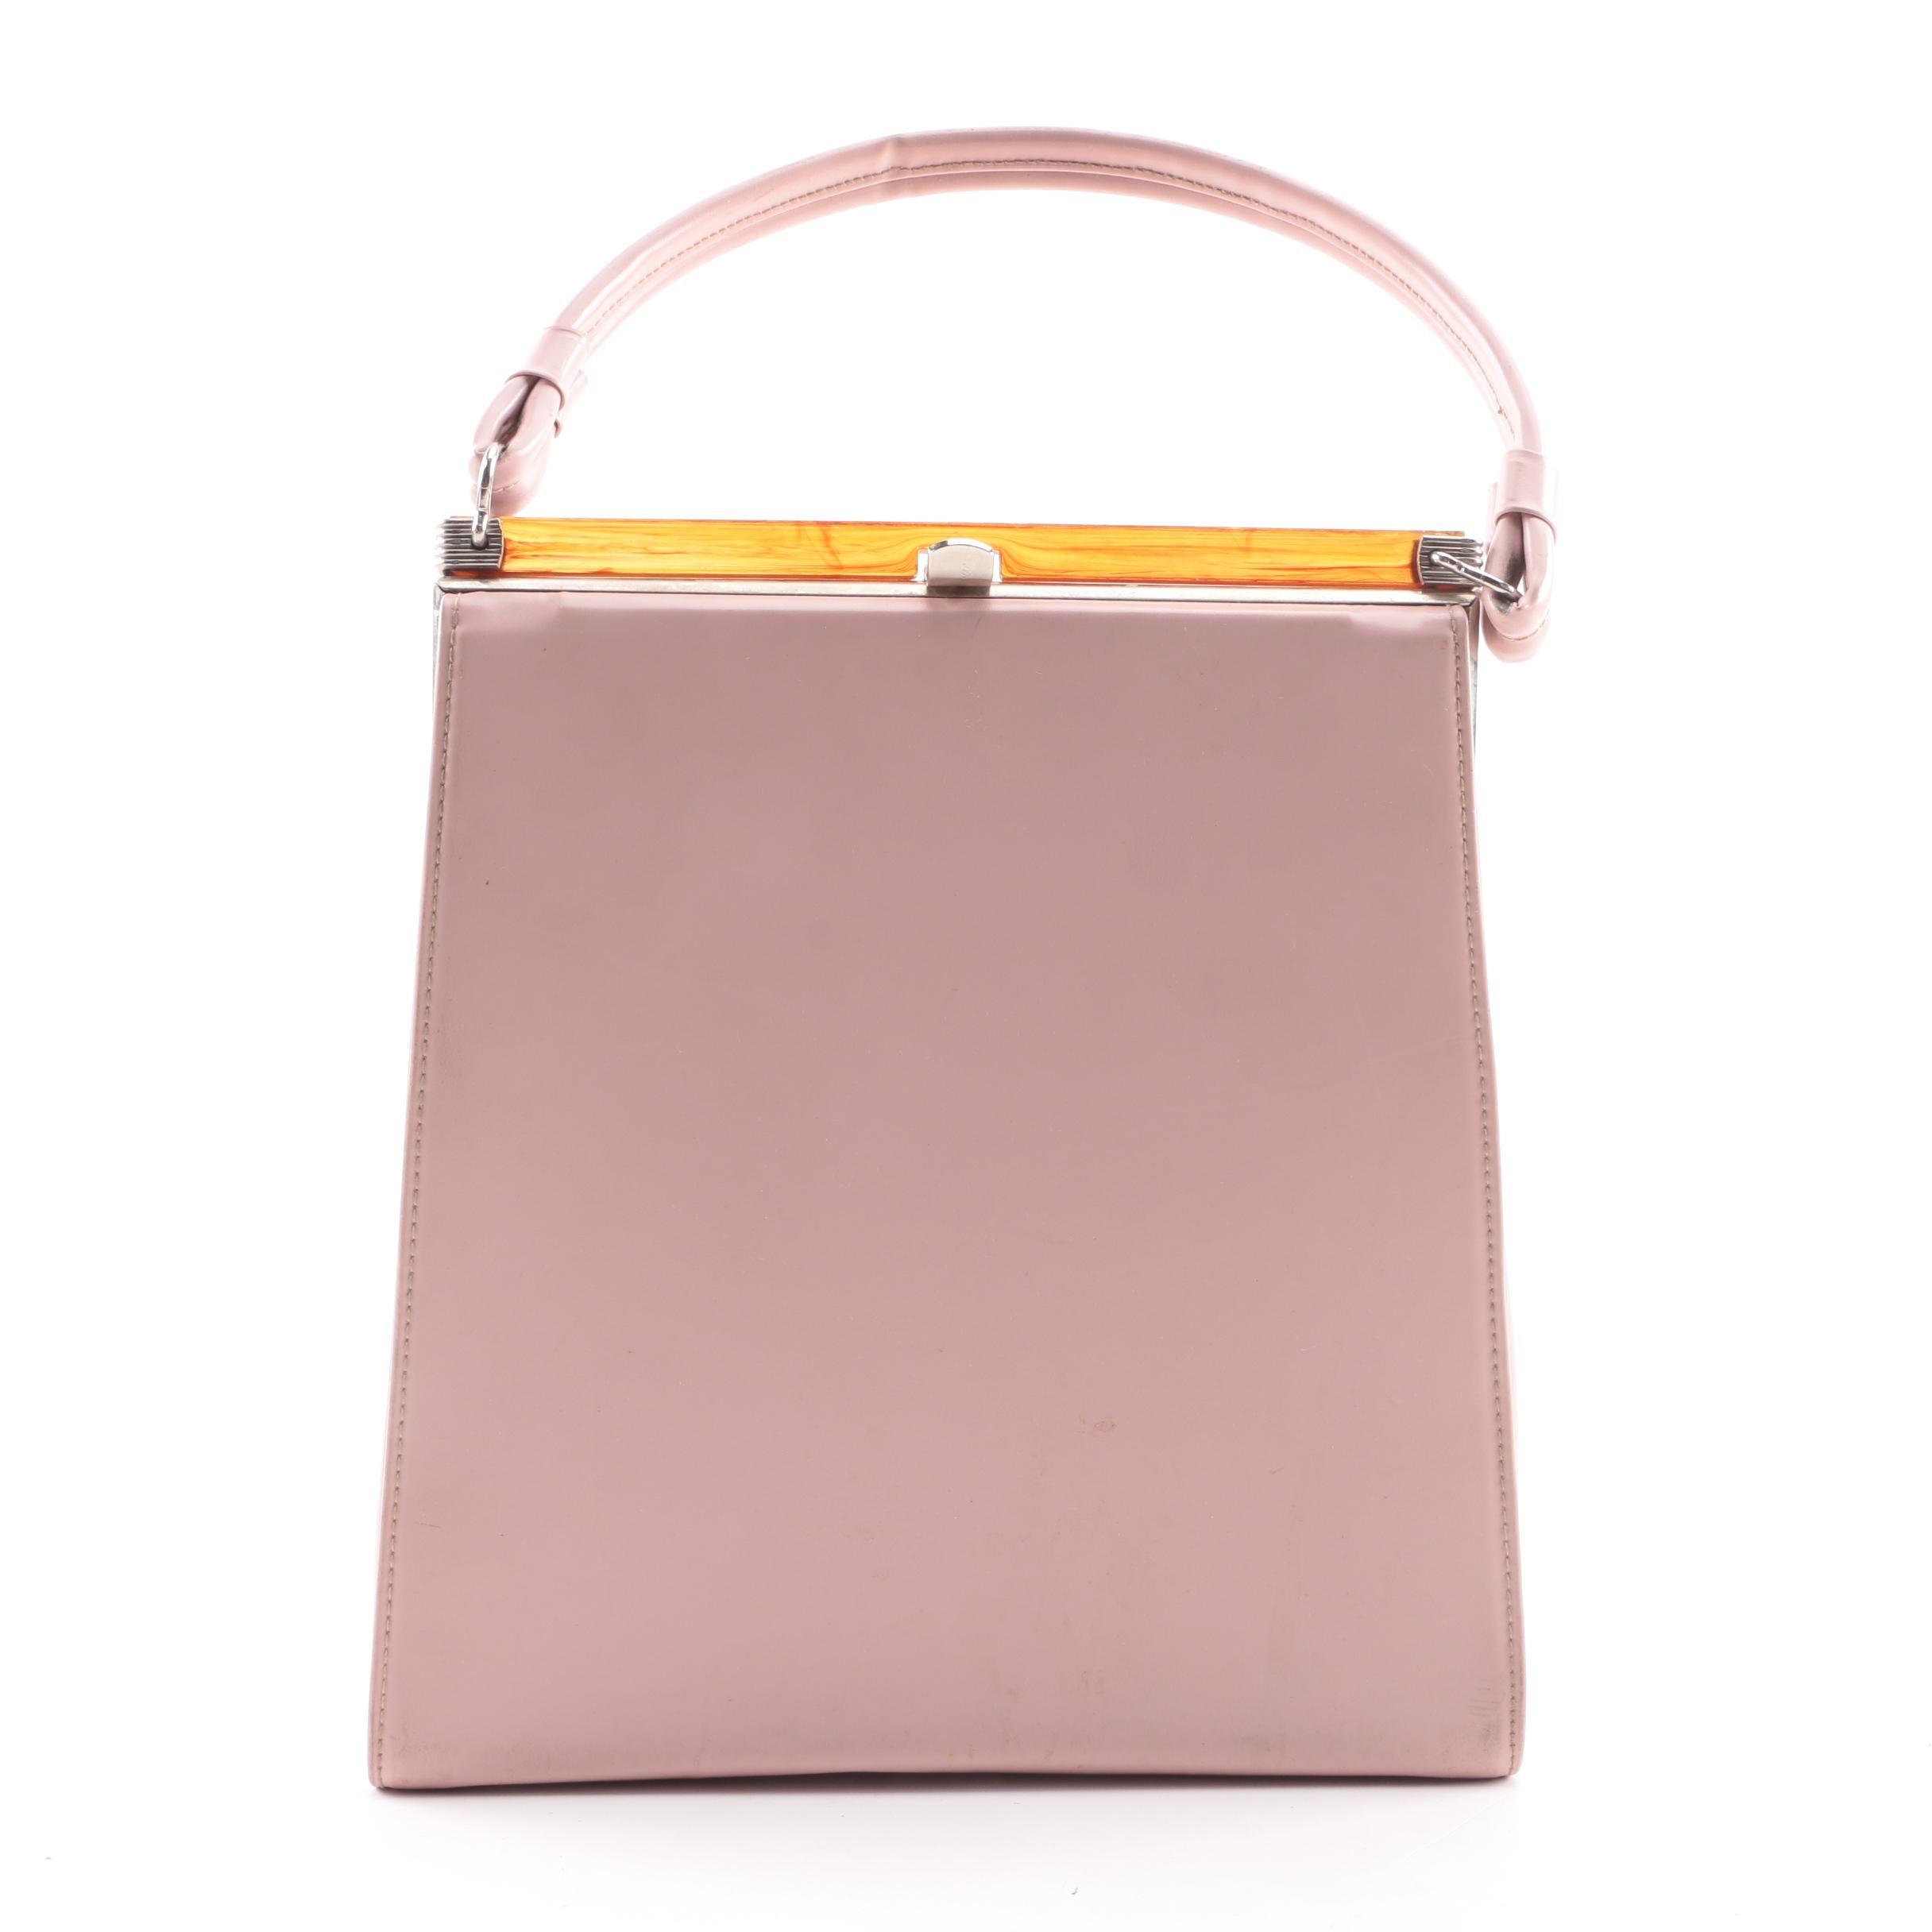 Vintage Pink Vinyl Top Handle Handbag